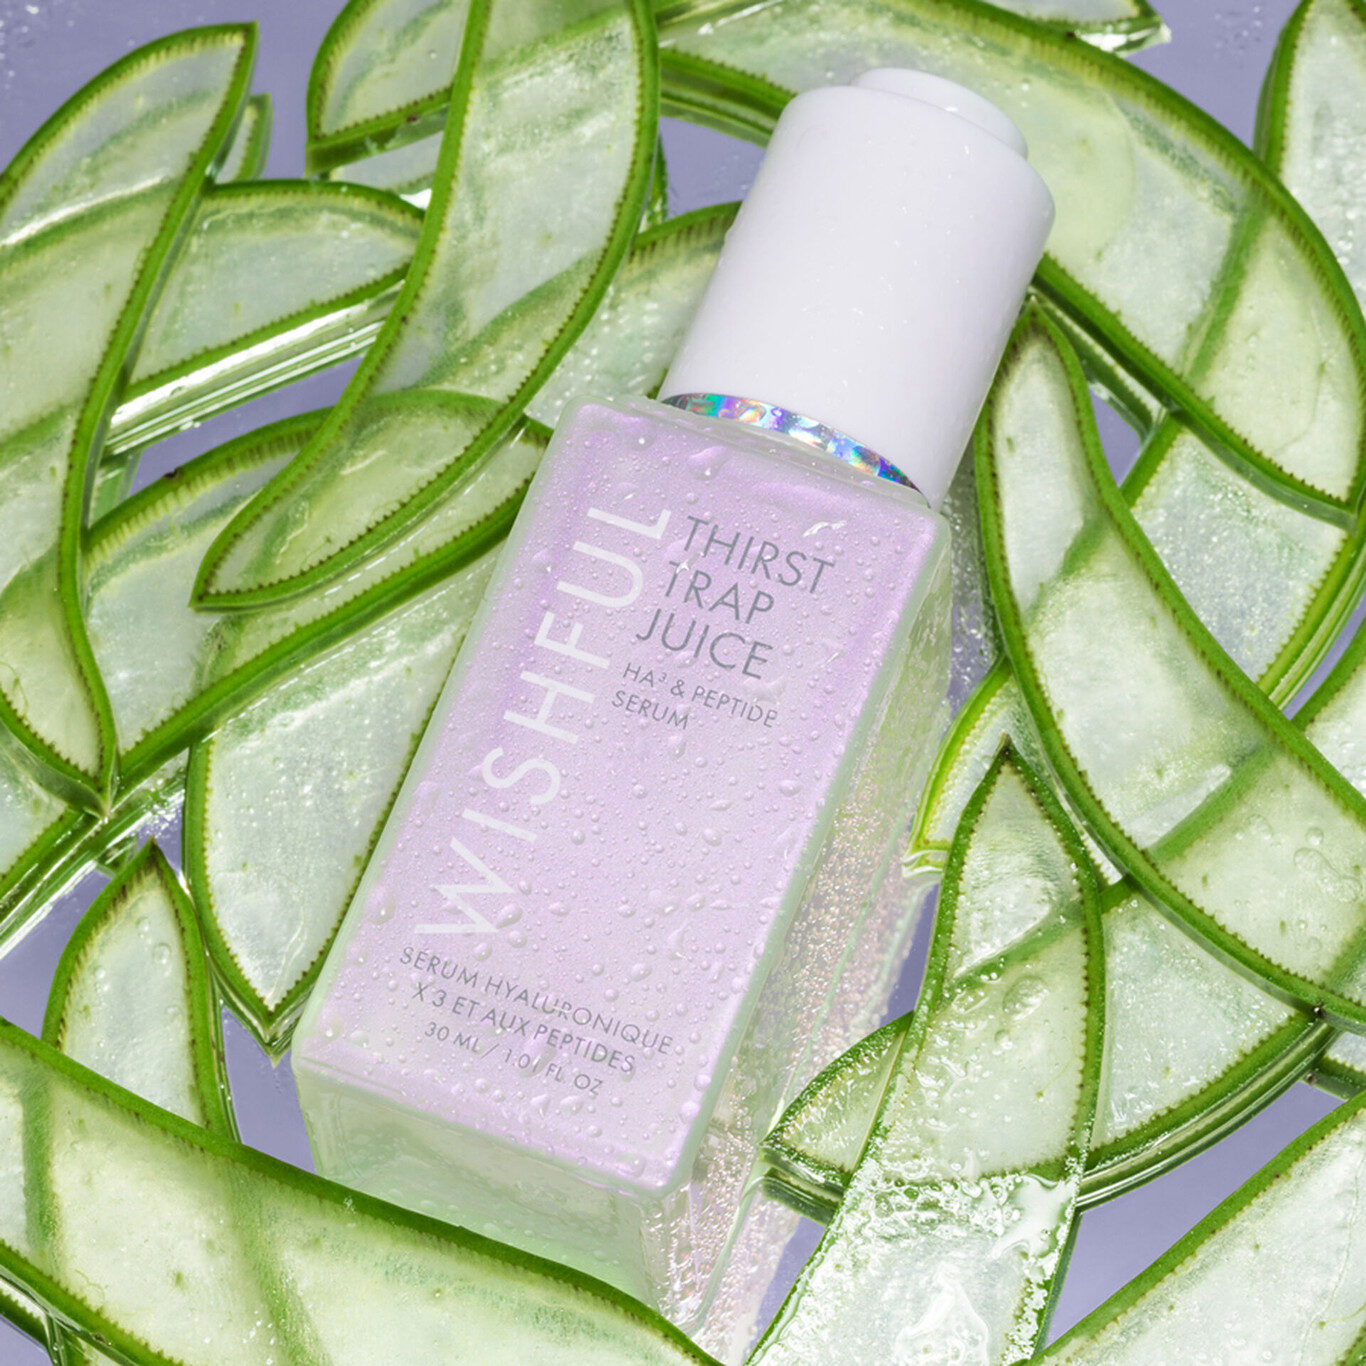 Wishful Skin Thirst Trap Juice HA3 Peptide Serum Closed With Aloe Promo